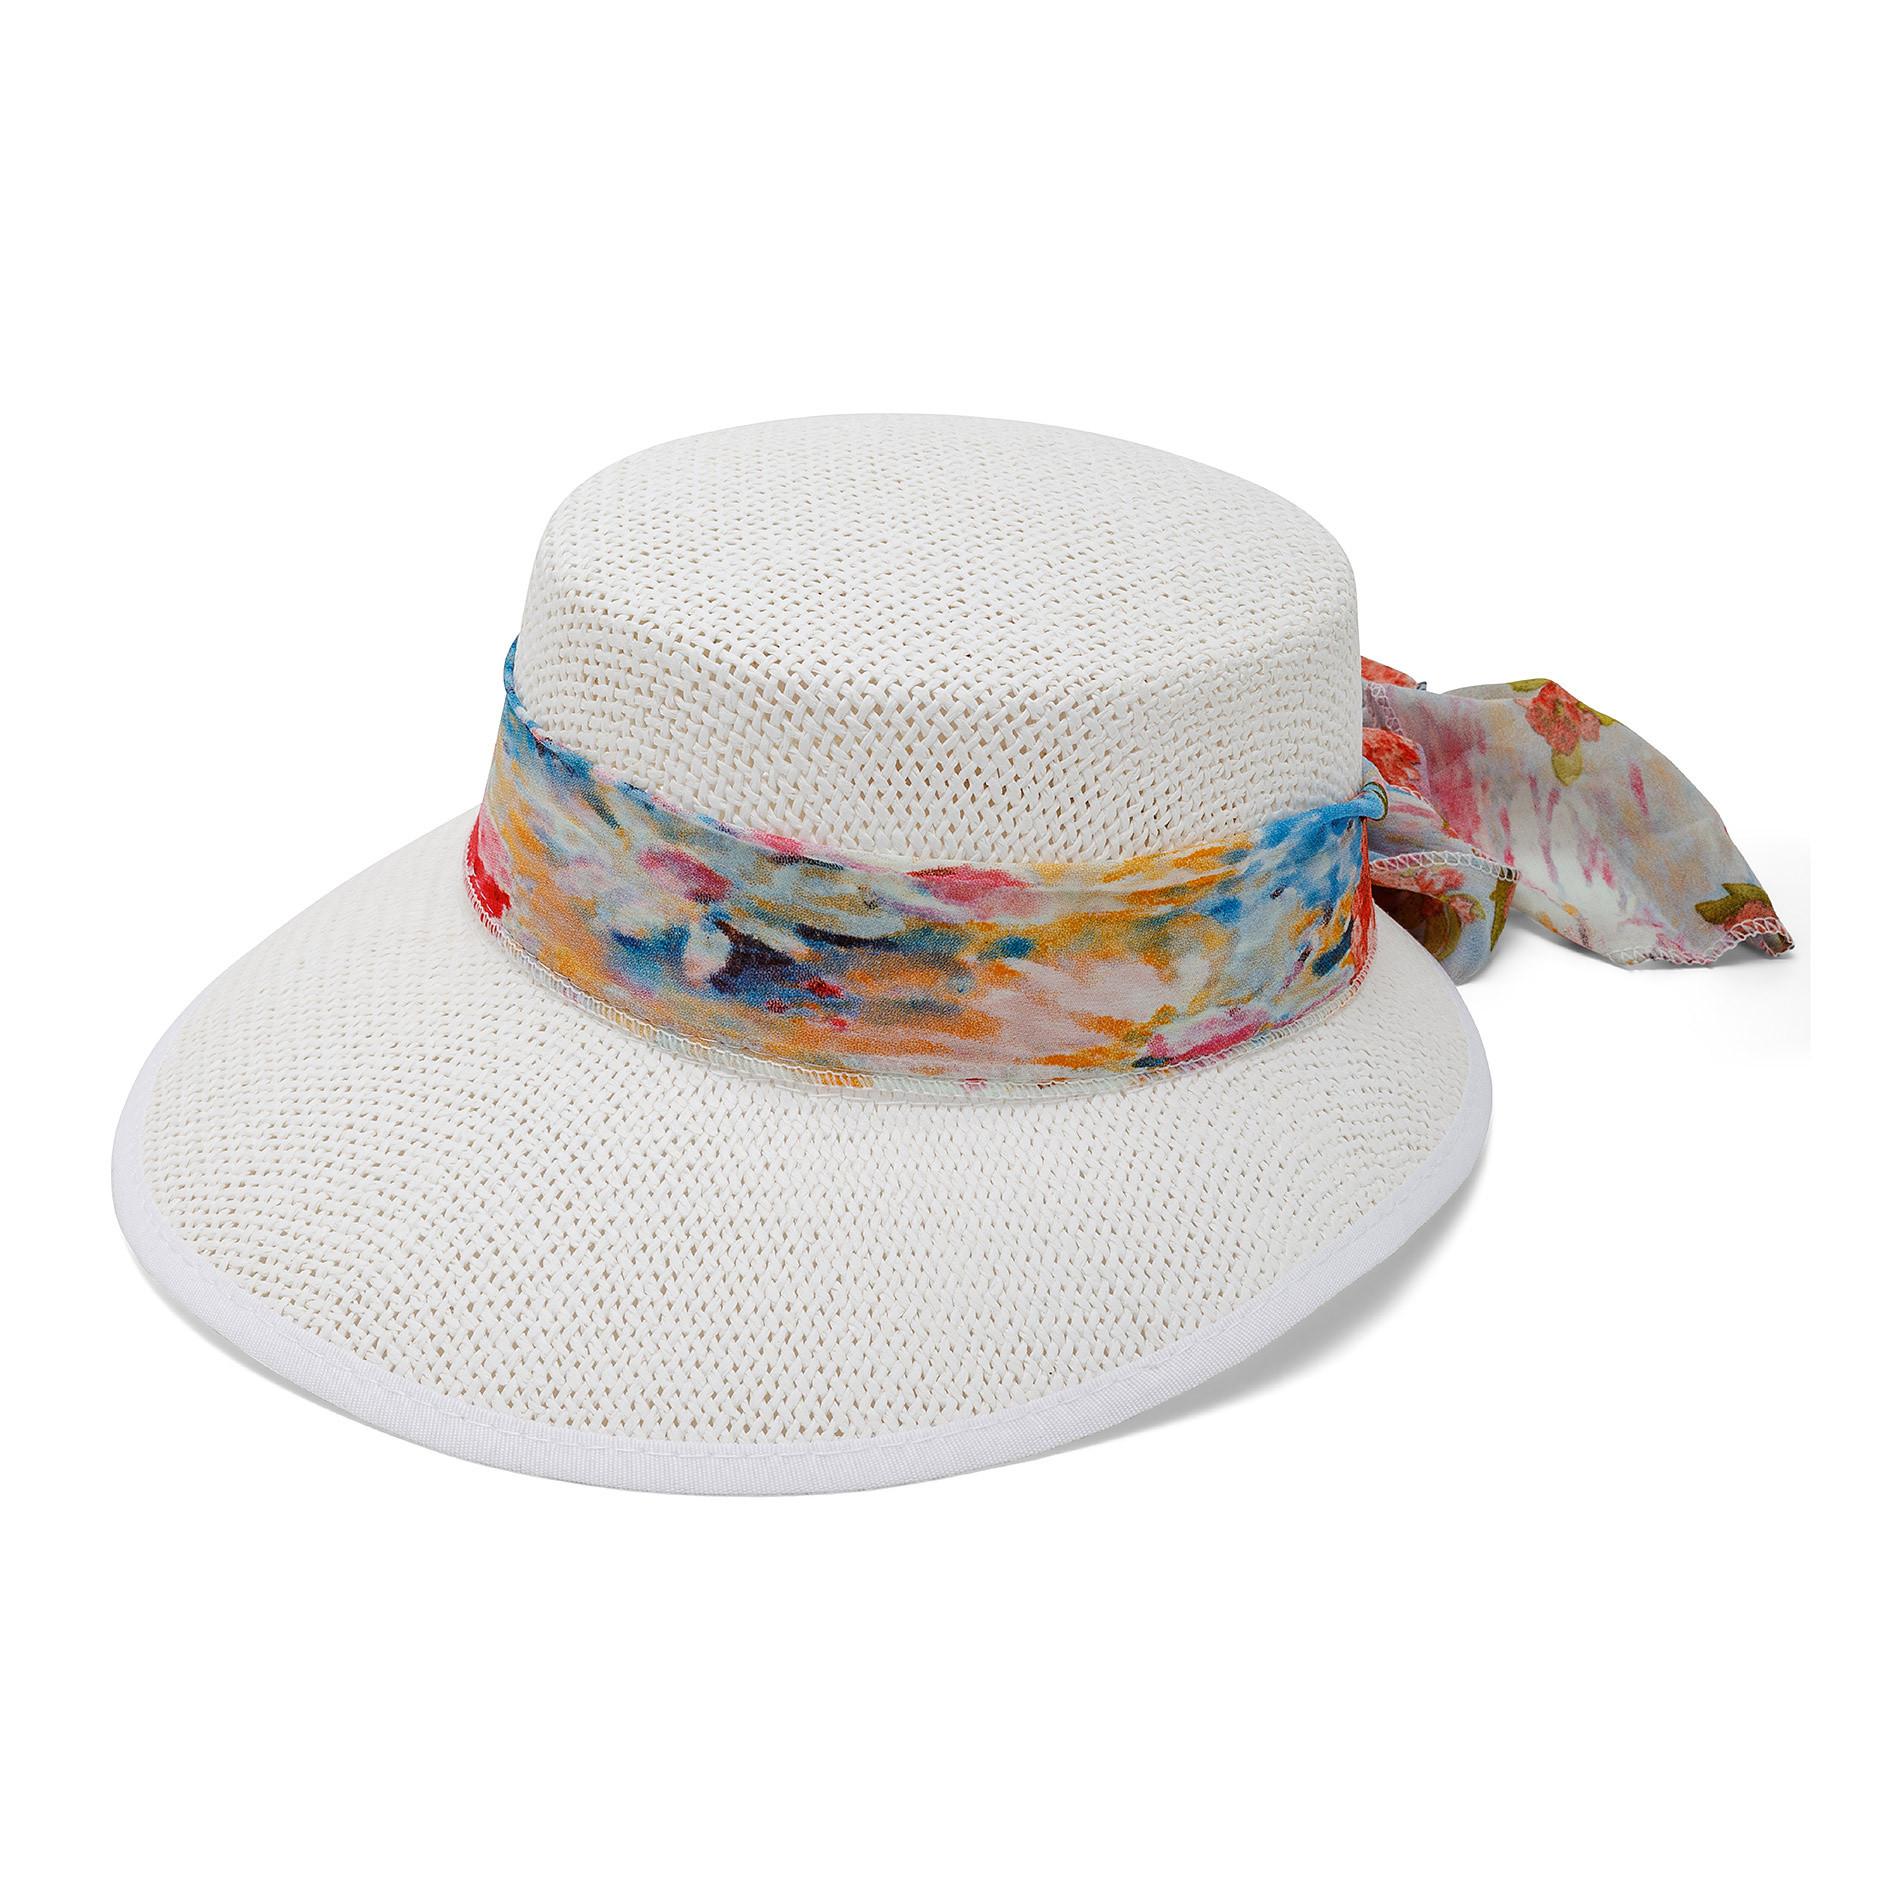 Cappello di paglia con foulard fantasia Koan, Bianco, large image number 0